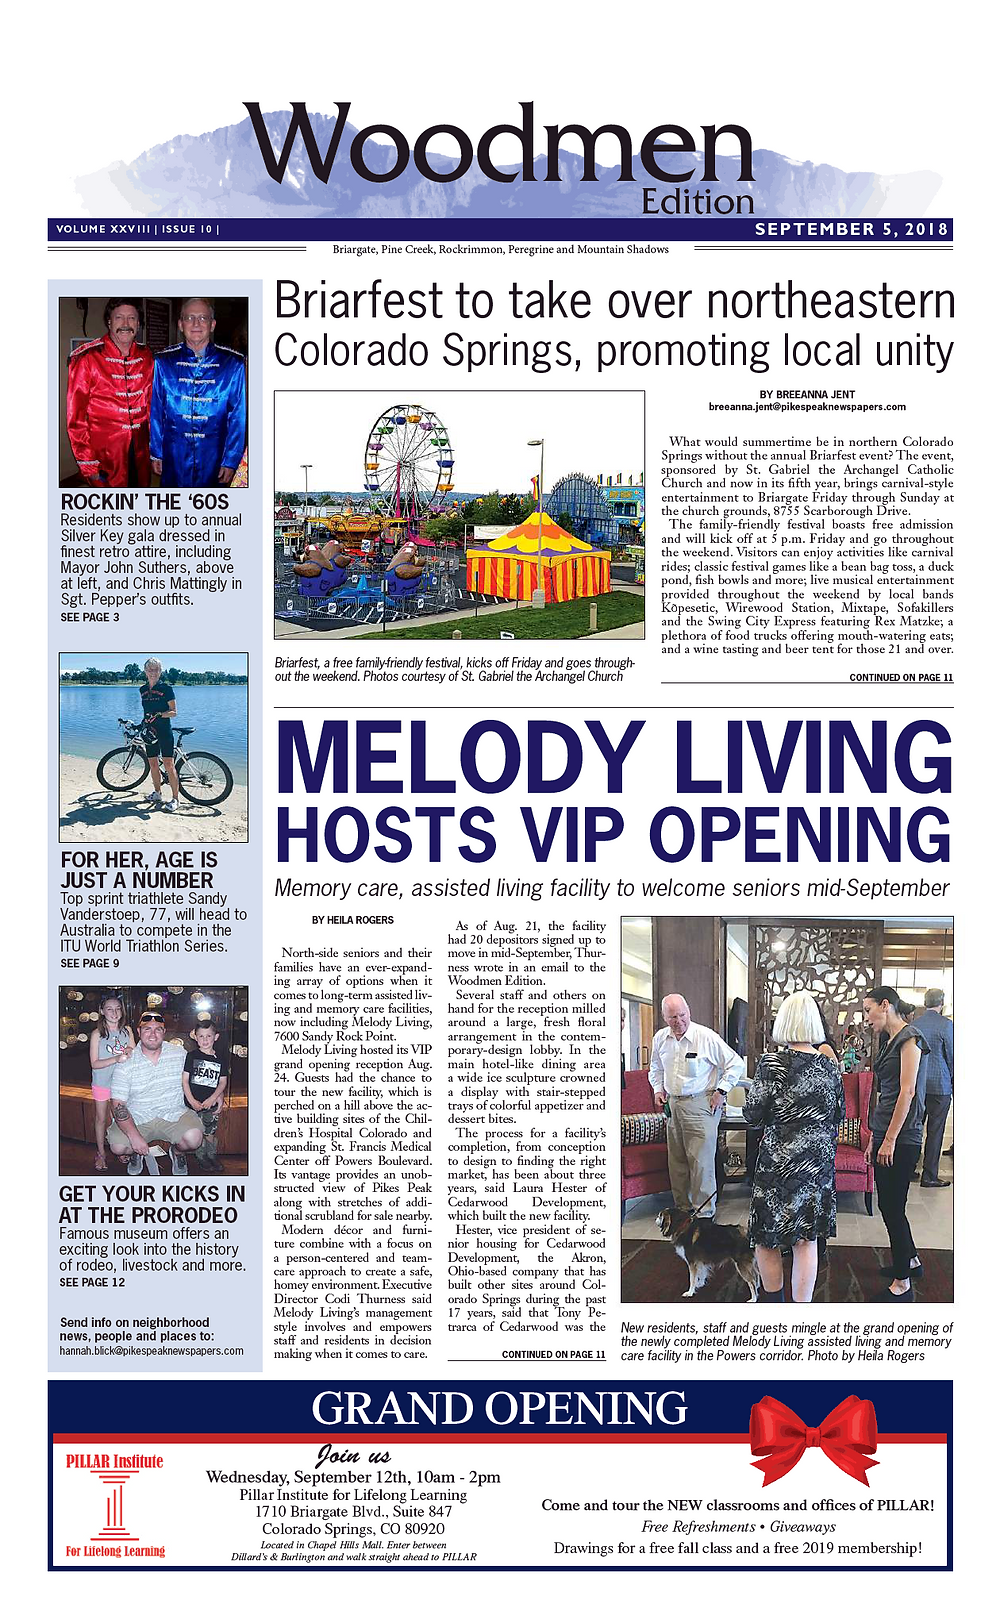 Local media coverage in Colorado Springs